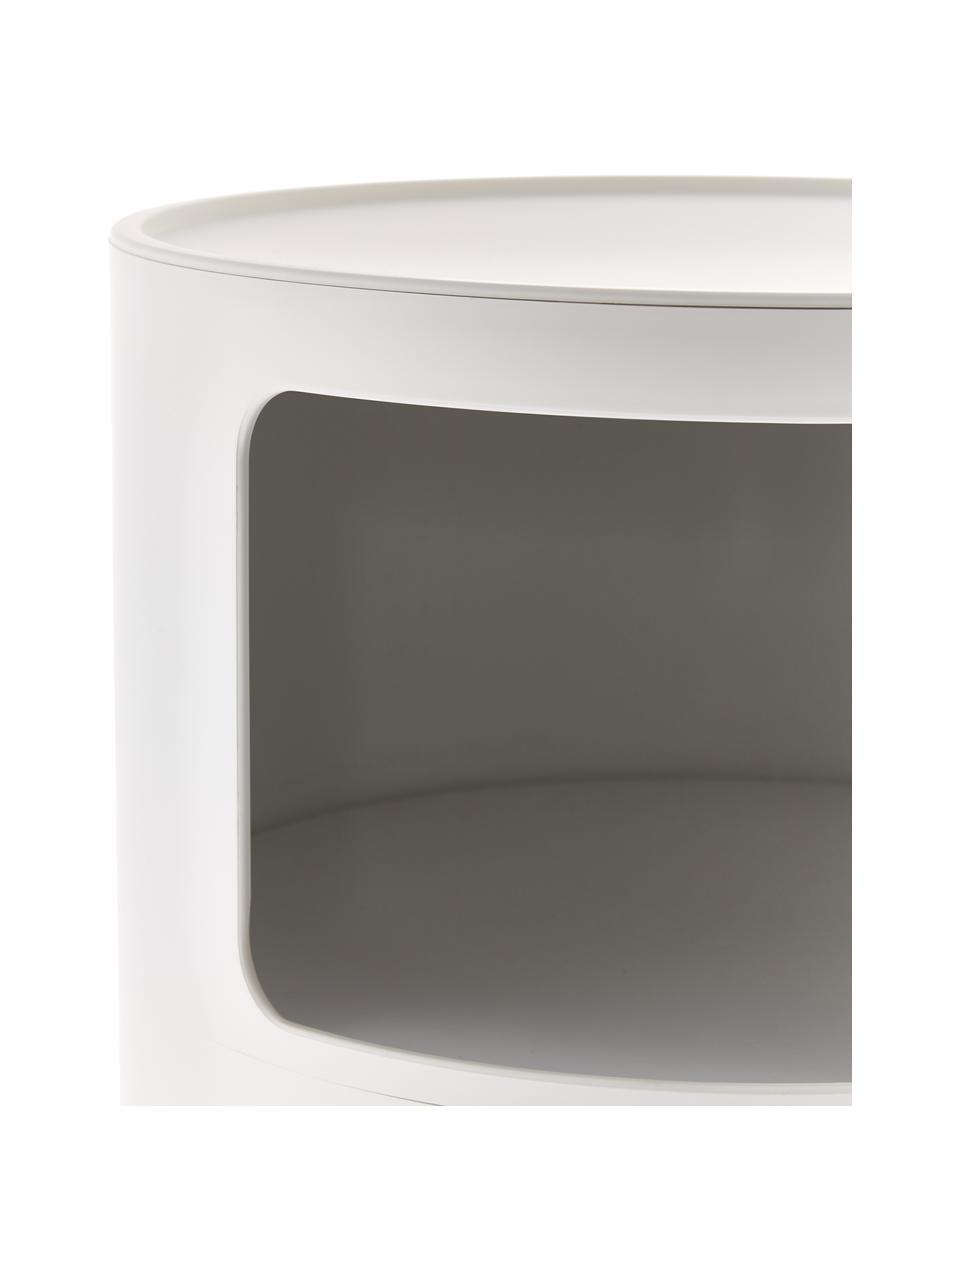 Design bijzettafel Componibile, 3 vakken, Gelakt kunststof (ABS), Mat wit, Ø 32 x H 59 cm